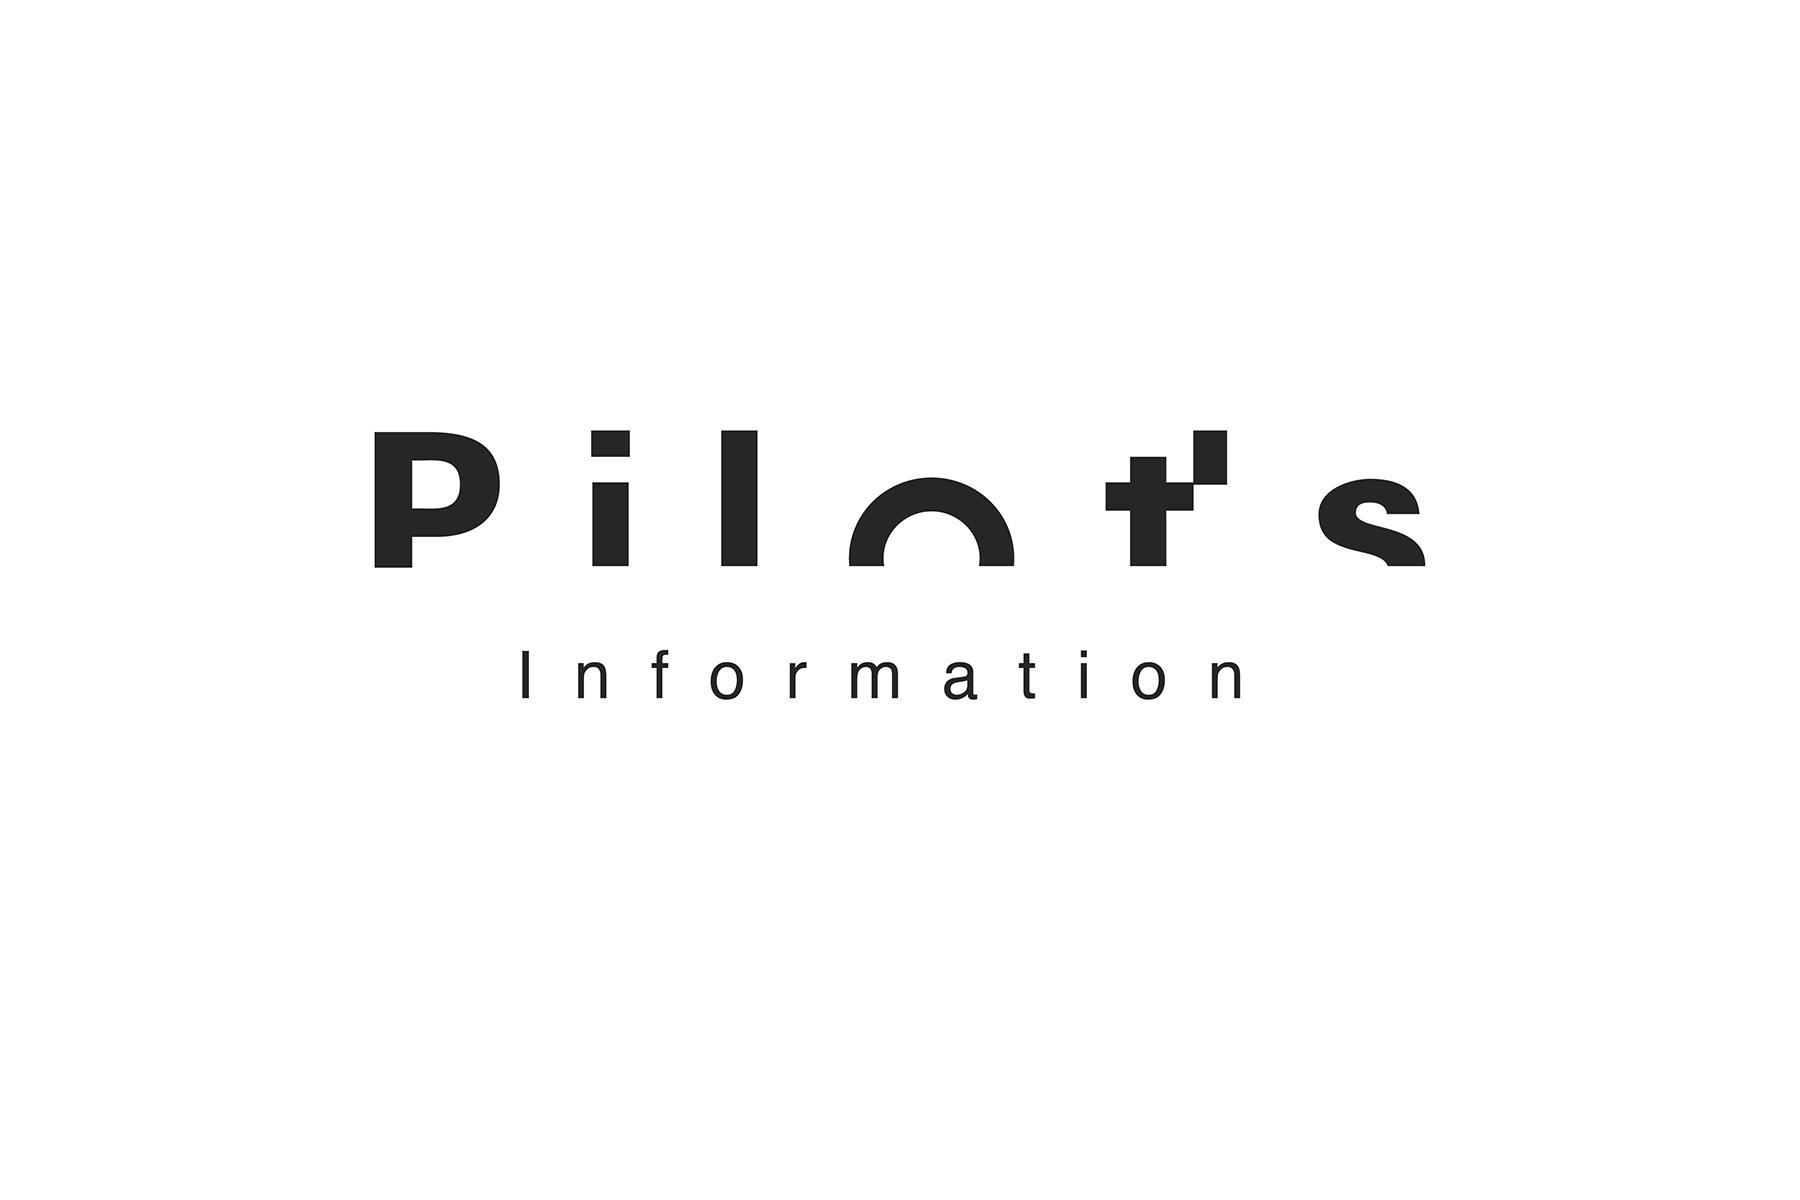 pilots logo social distance